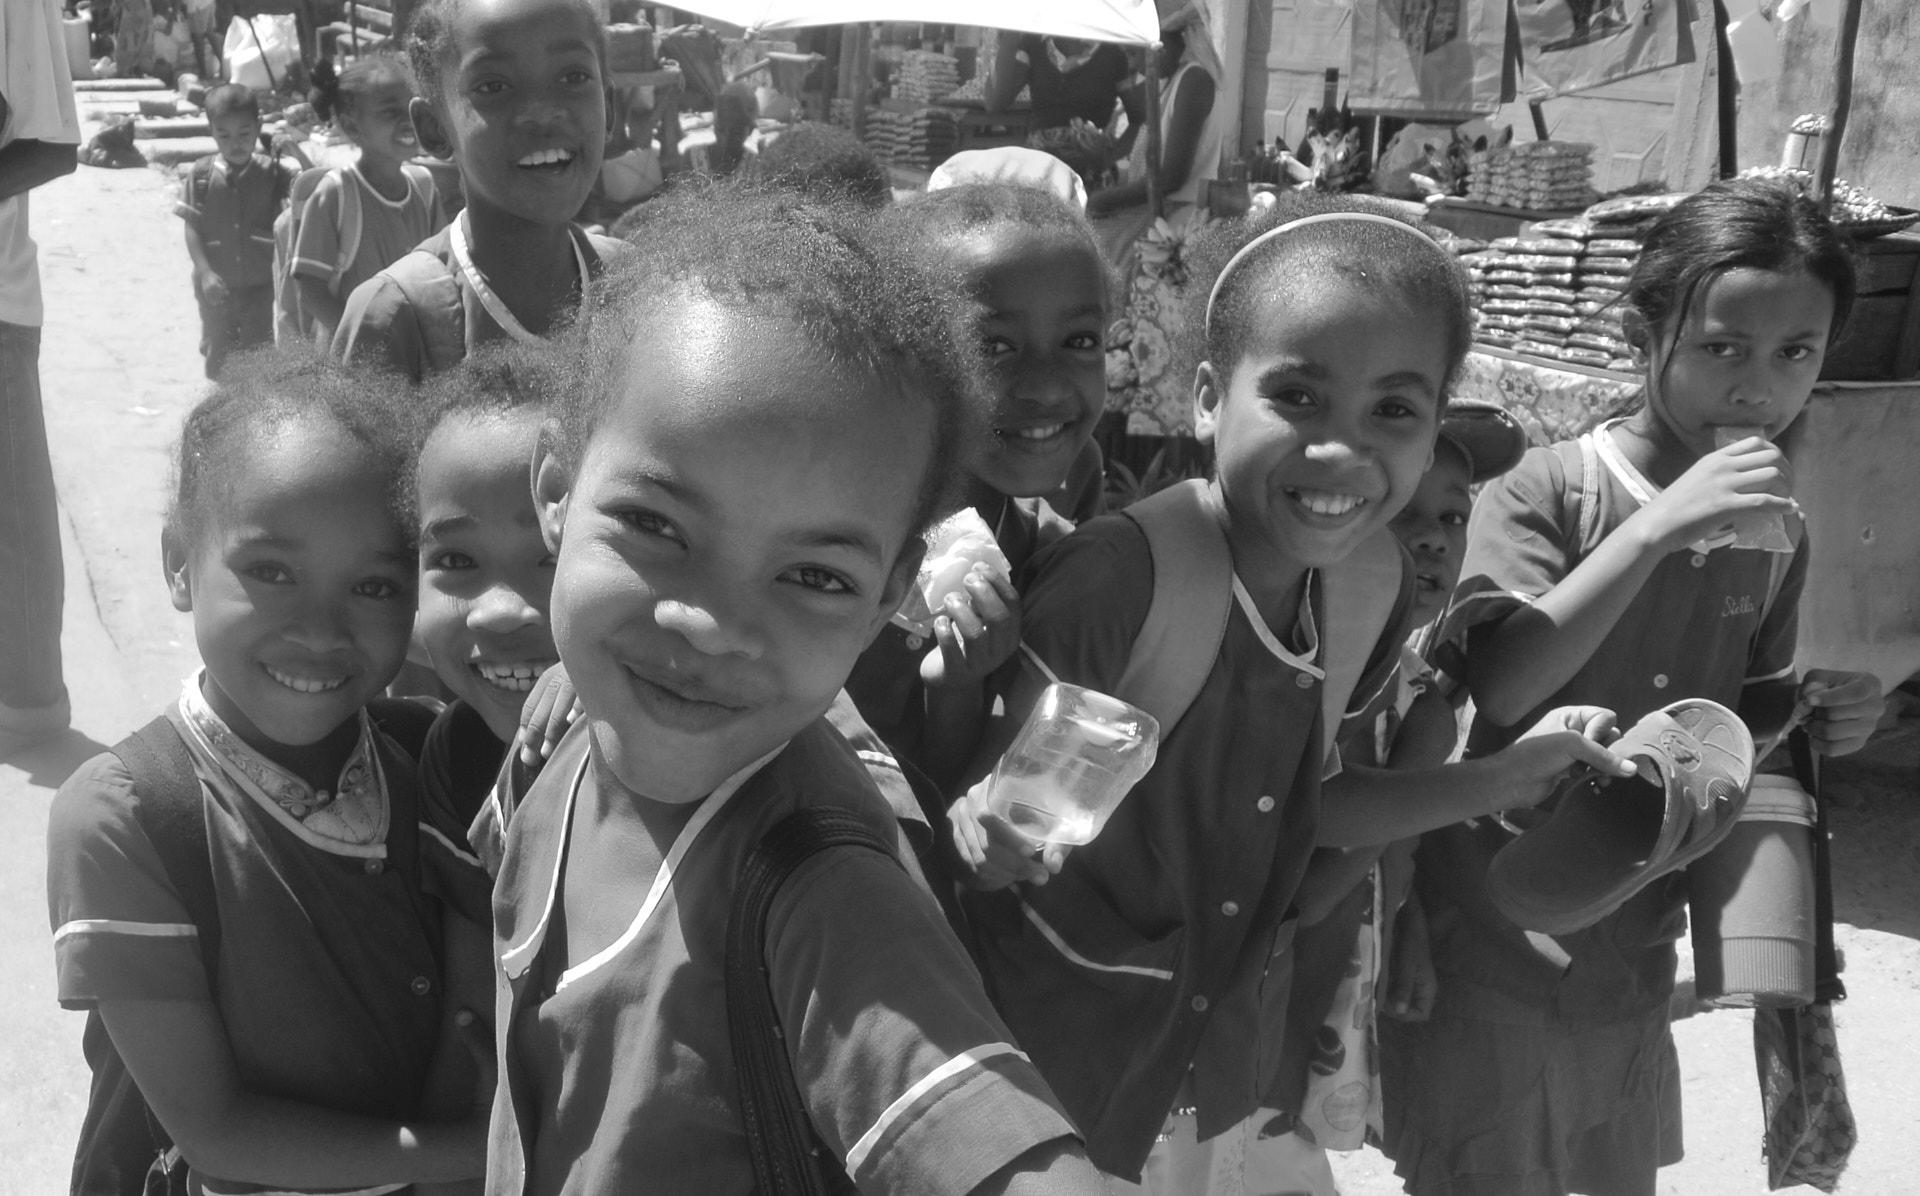 bambini malgasci